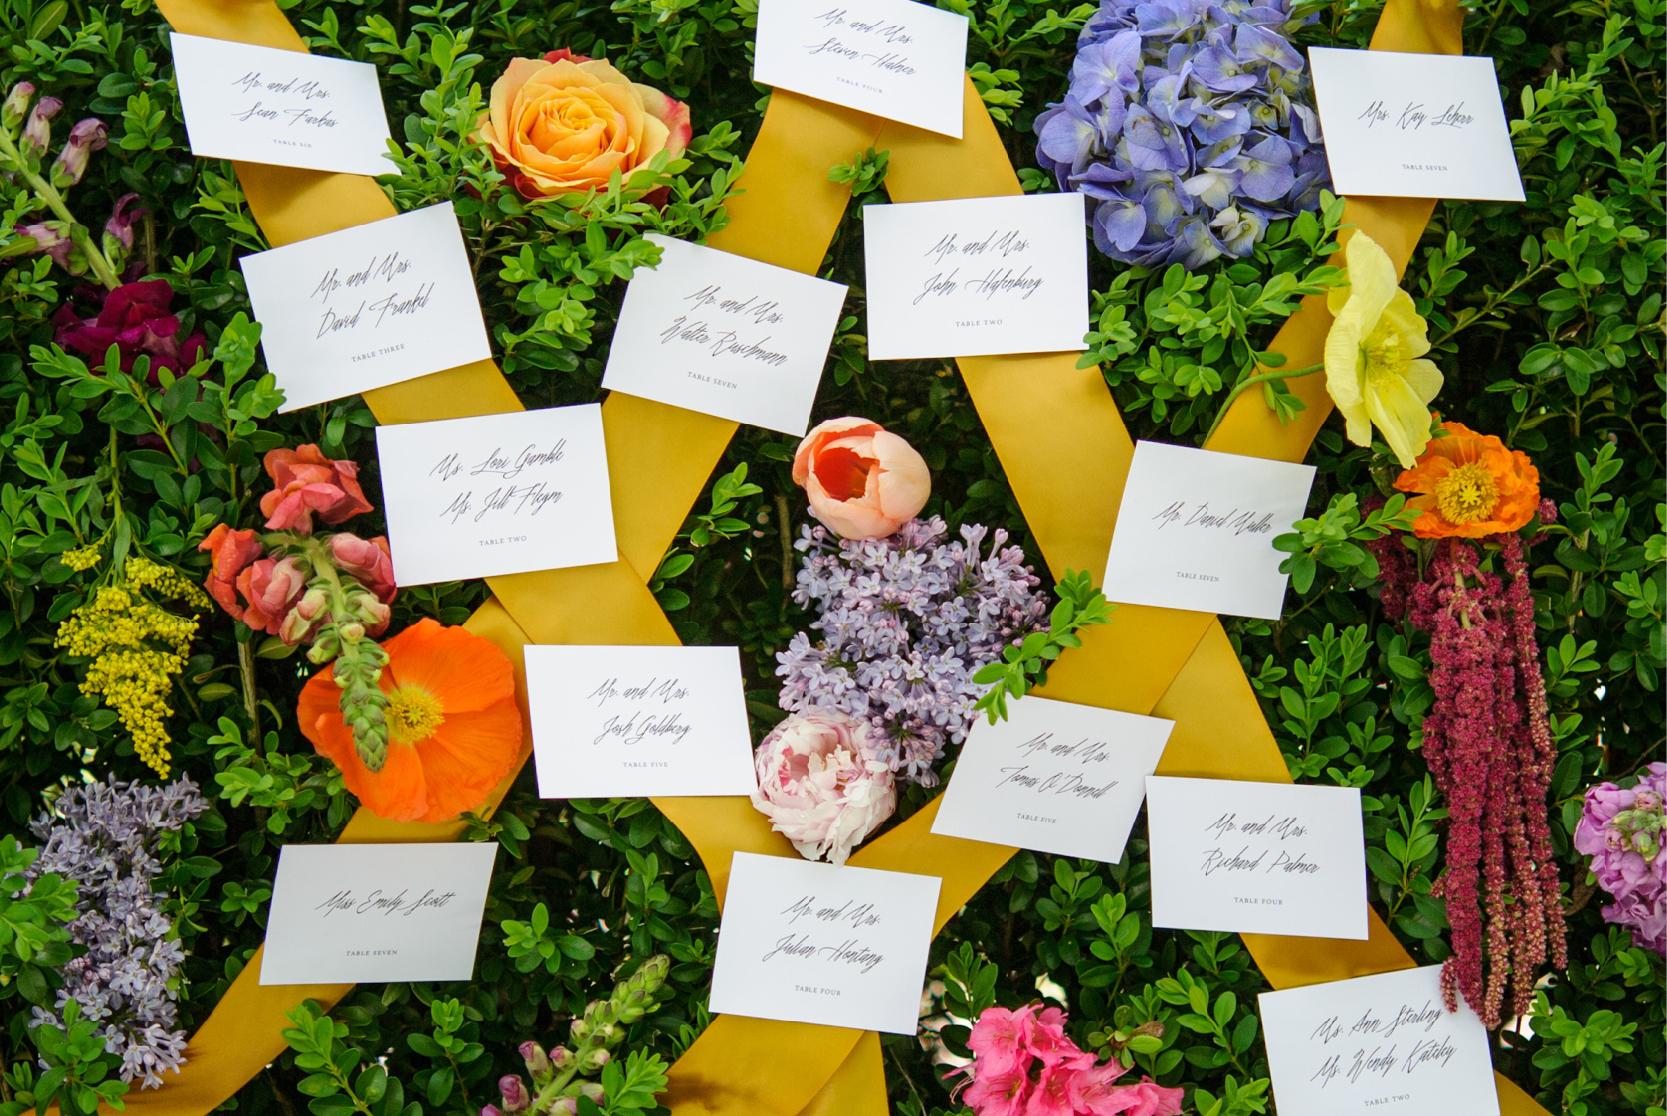 Gustav Klimt Inspired Escort Cards | Coral Pheasant